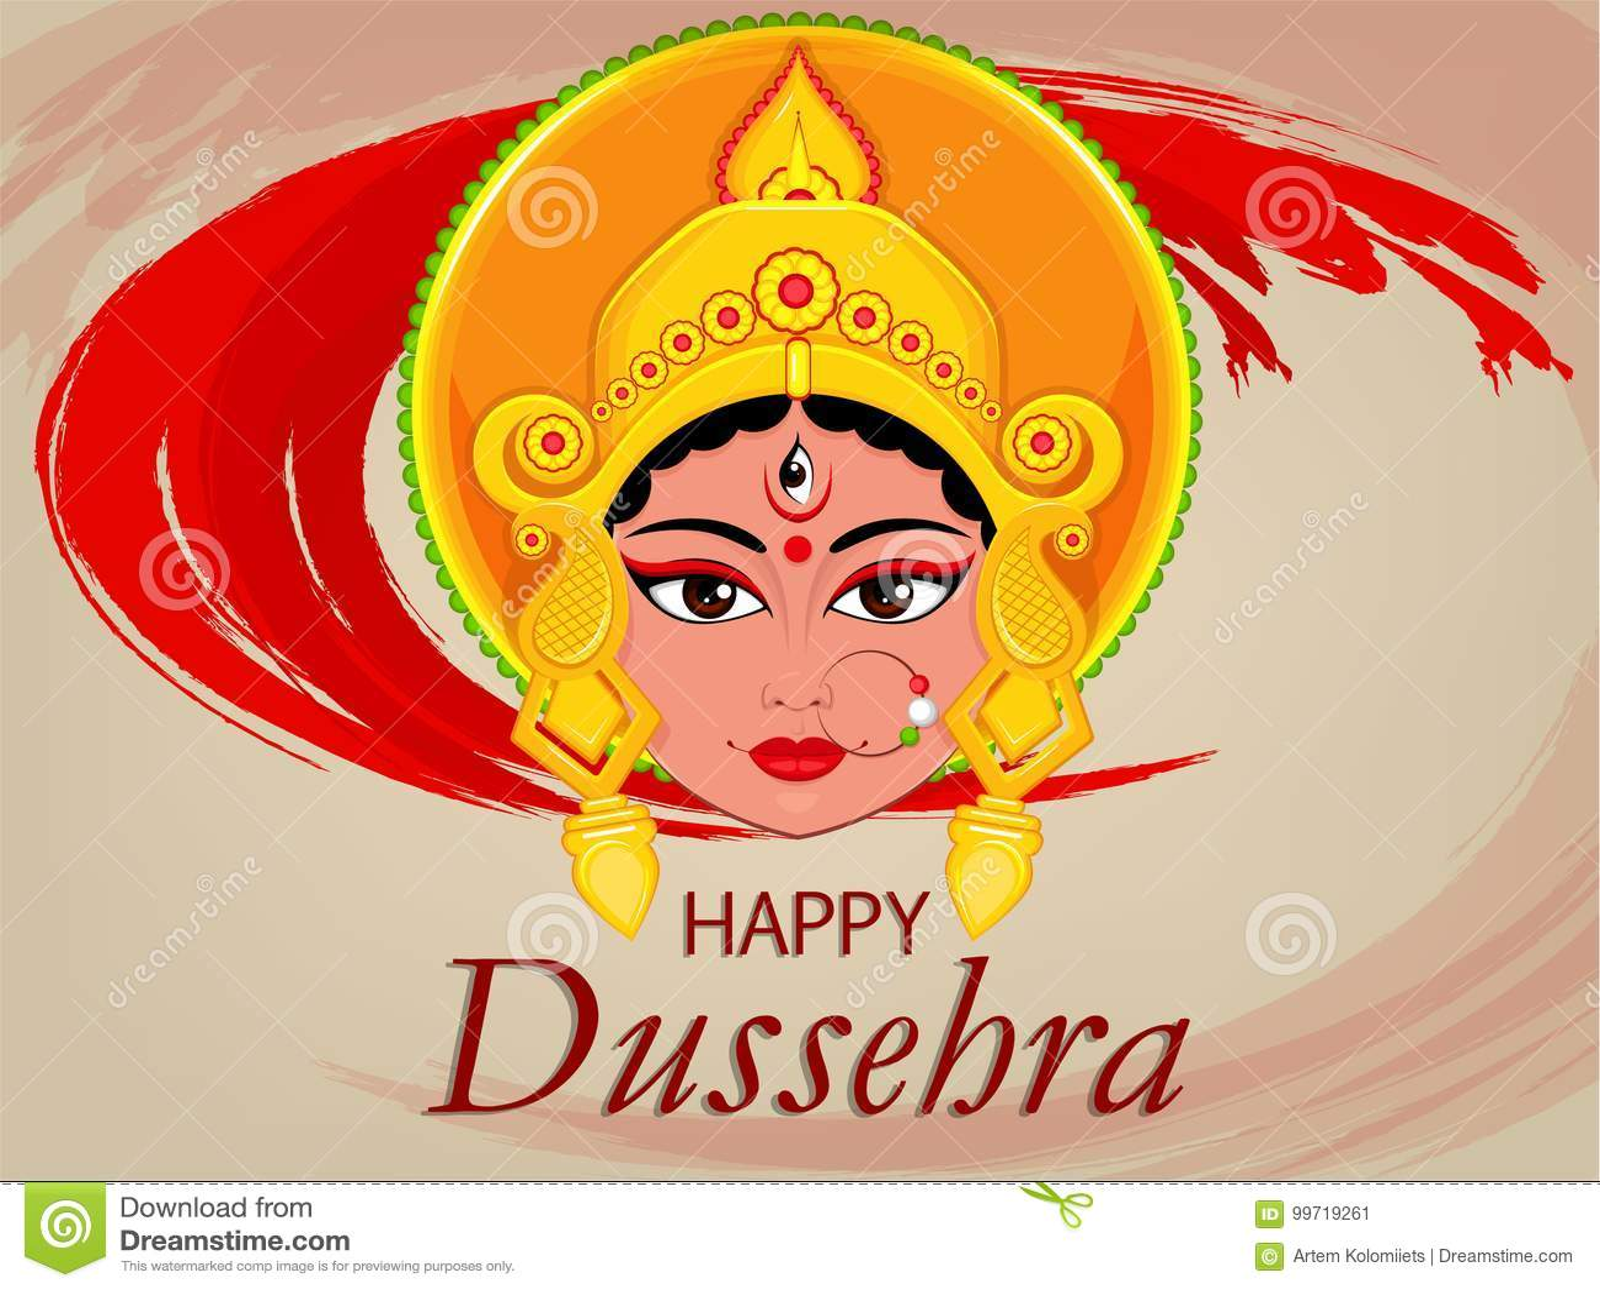 Happy dussehra greeting card maa durga face for hindu festival download happy dussehra greeting card maa durga face for hindu festival stock vector illustration m4hsunfo